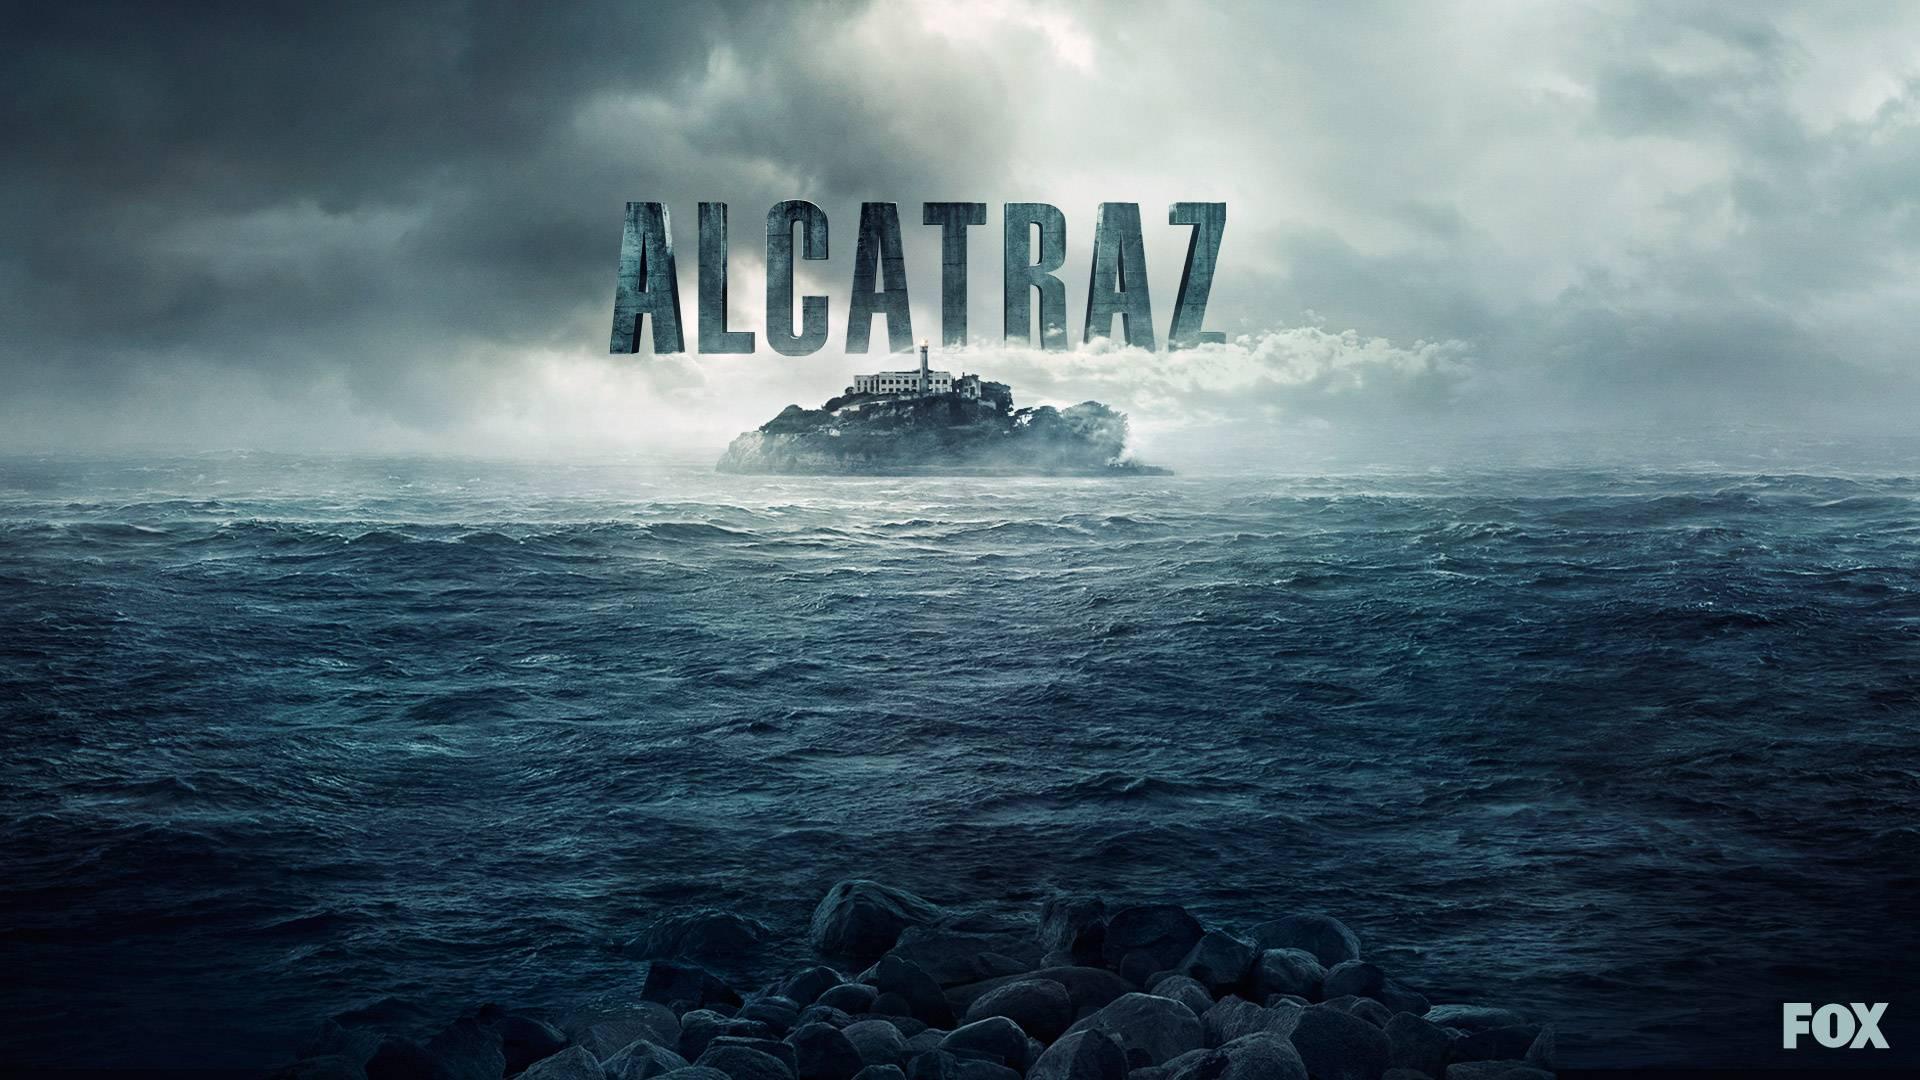 21937_alcatraz_wallpaper_02_122_248lo.jpg